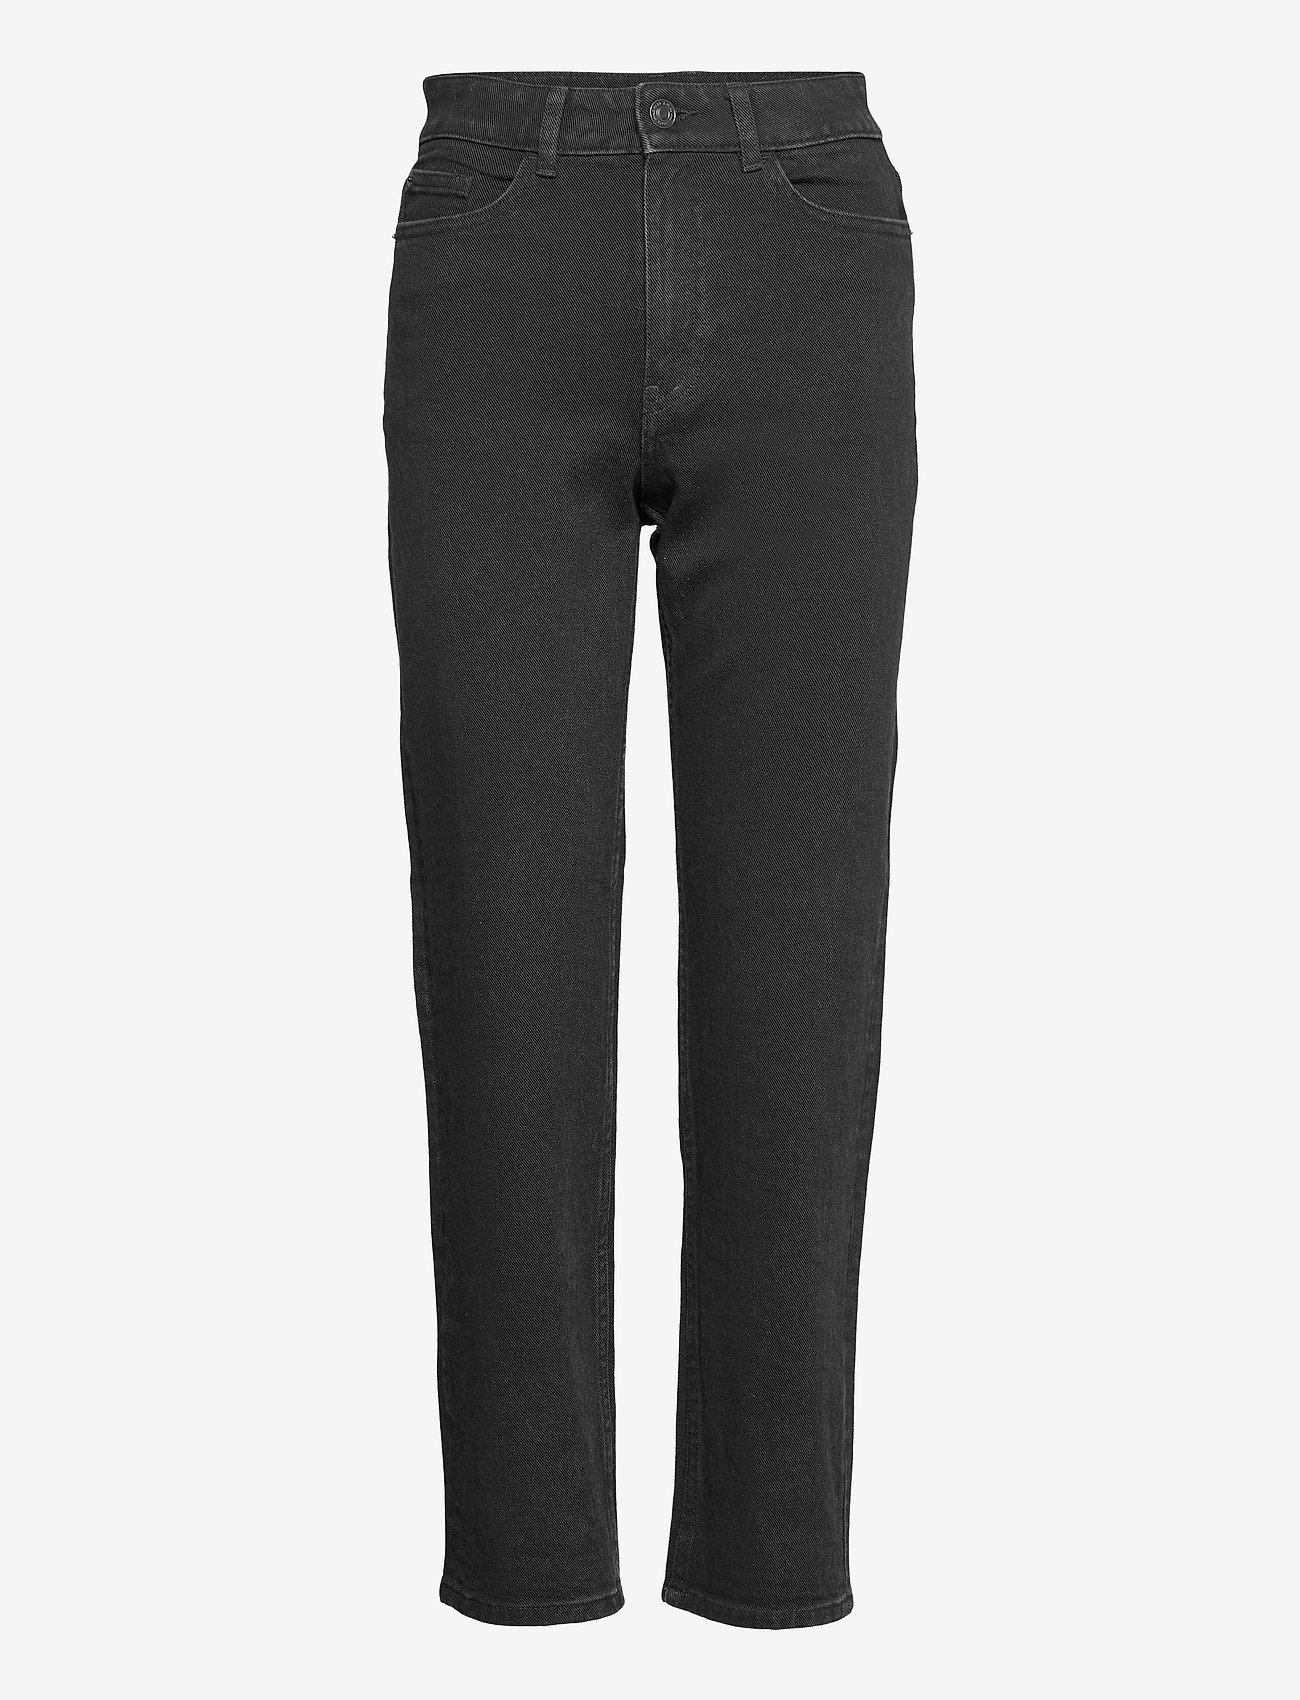 Lindex - Denim trousers Nea black - mom jeans - black - 0